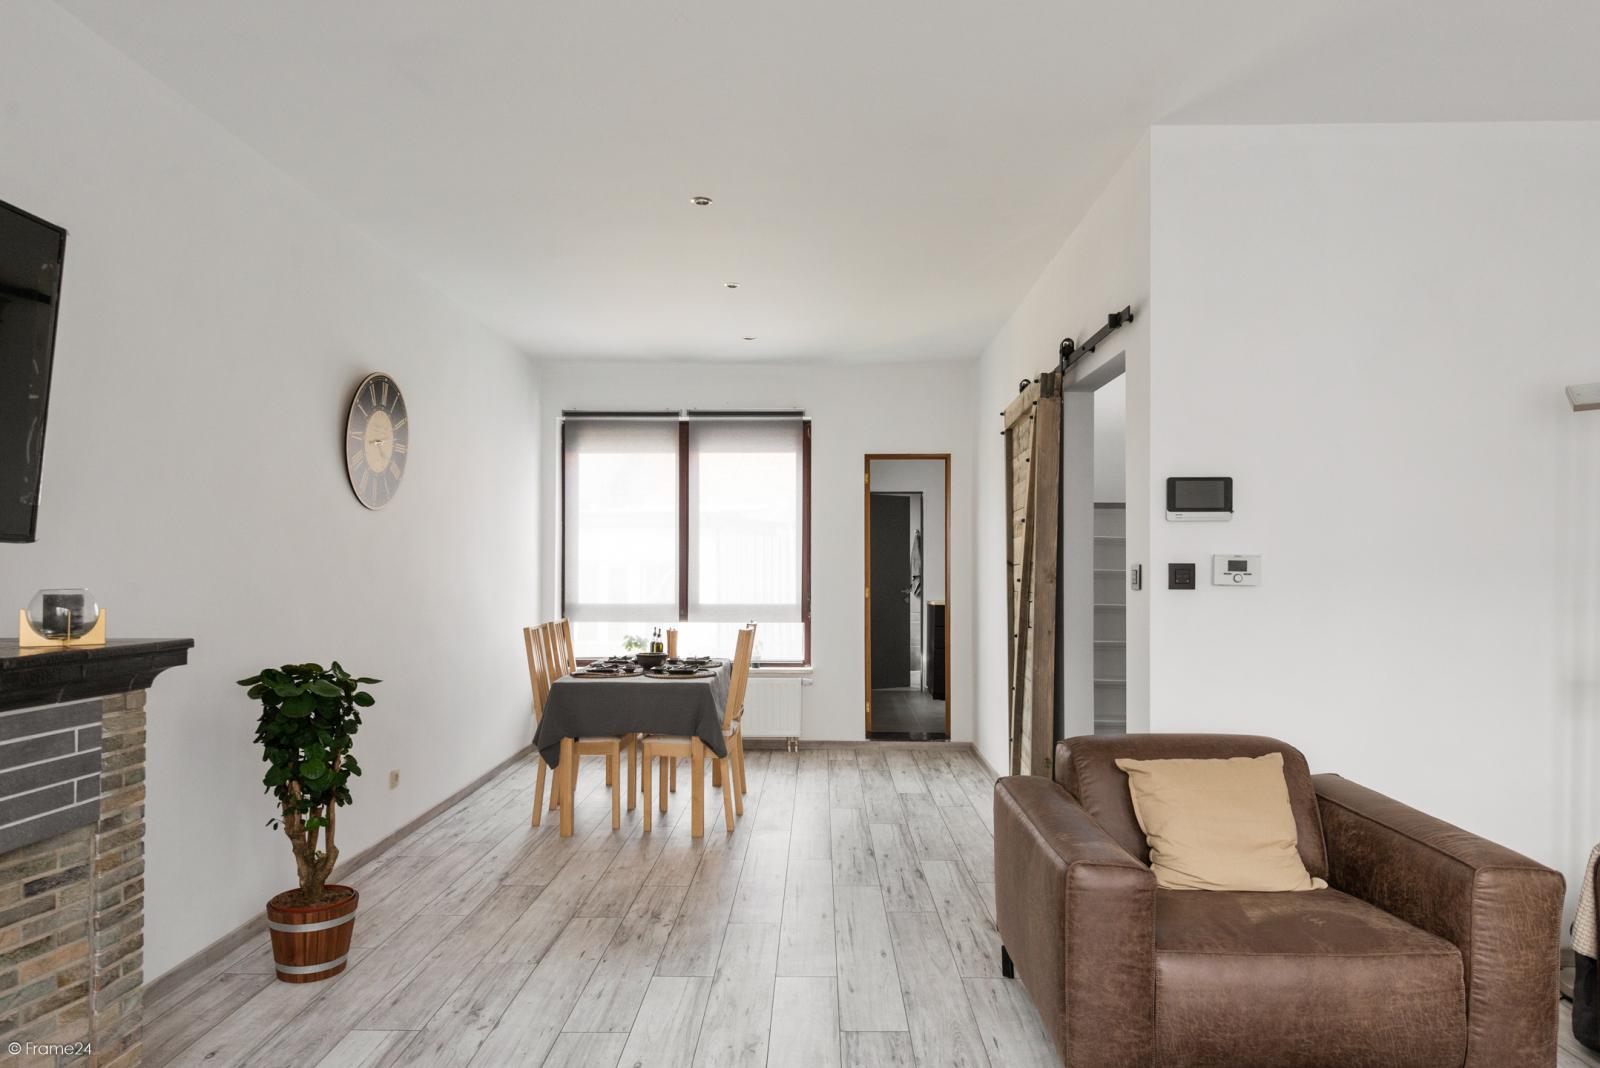 Zeer mooie bel-étage woning met inpandige garage en gezellige patio! afbeelding 5